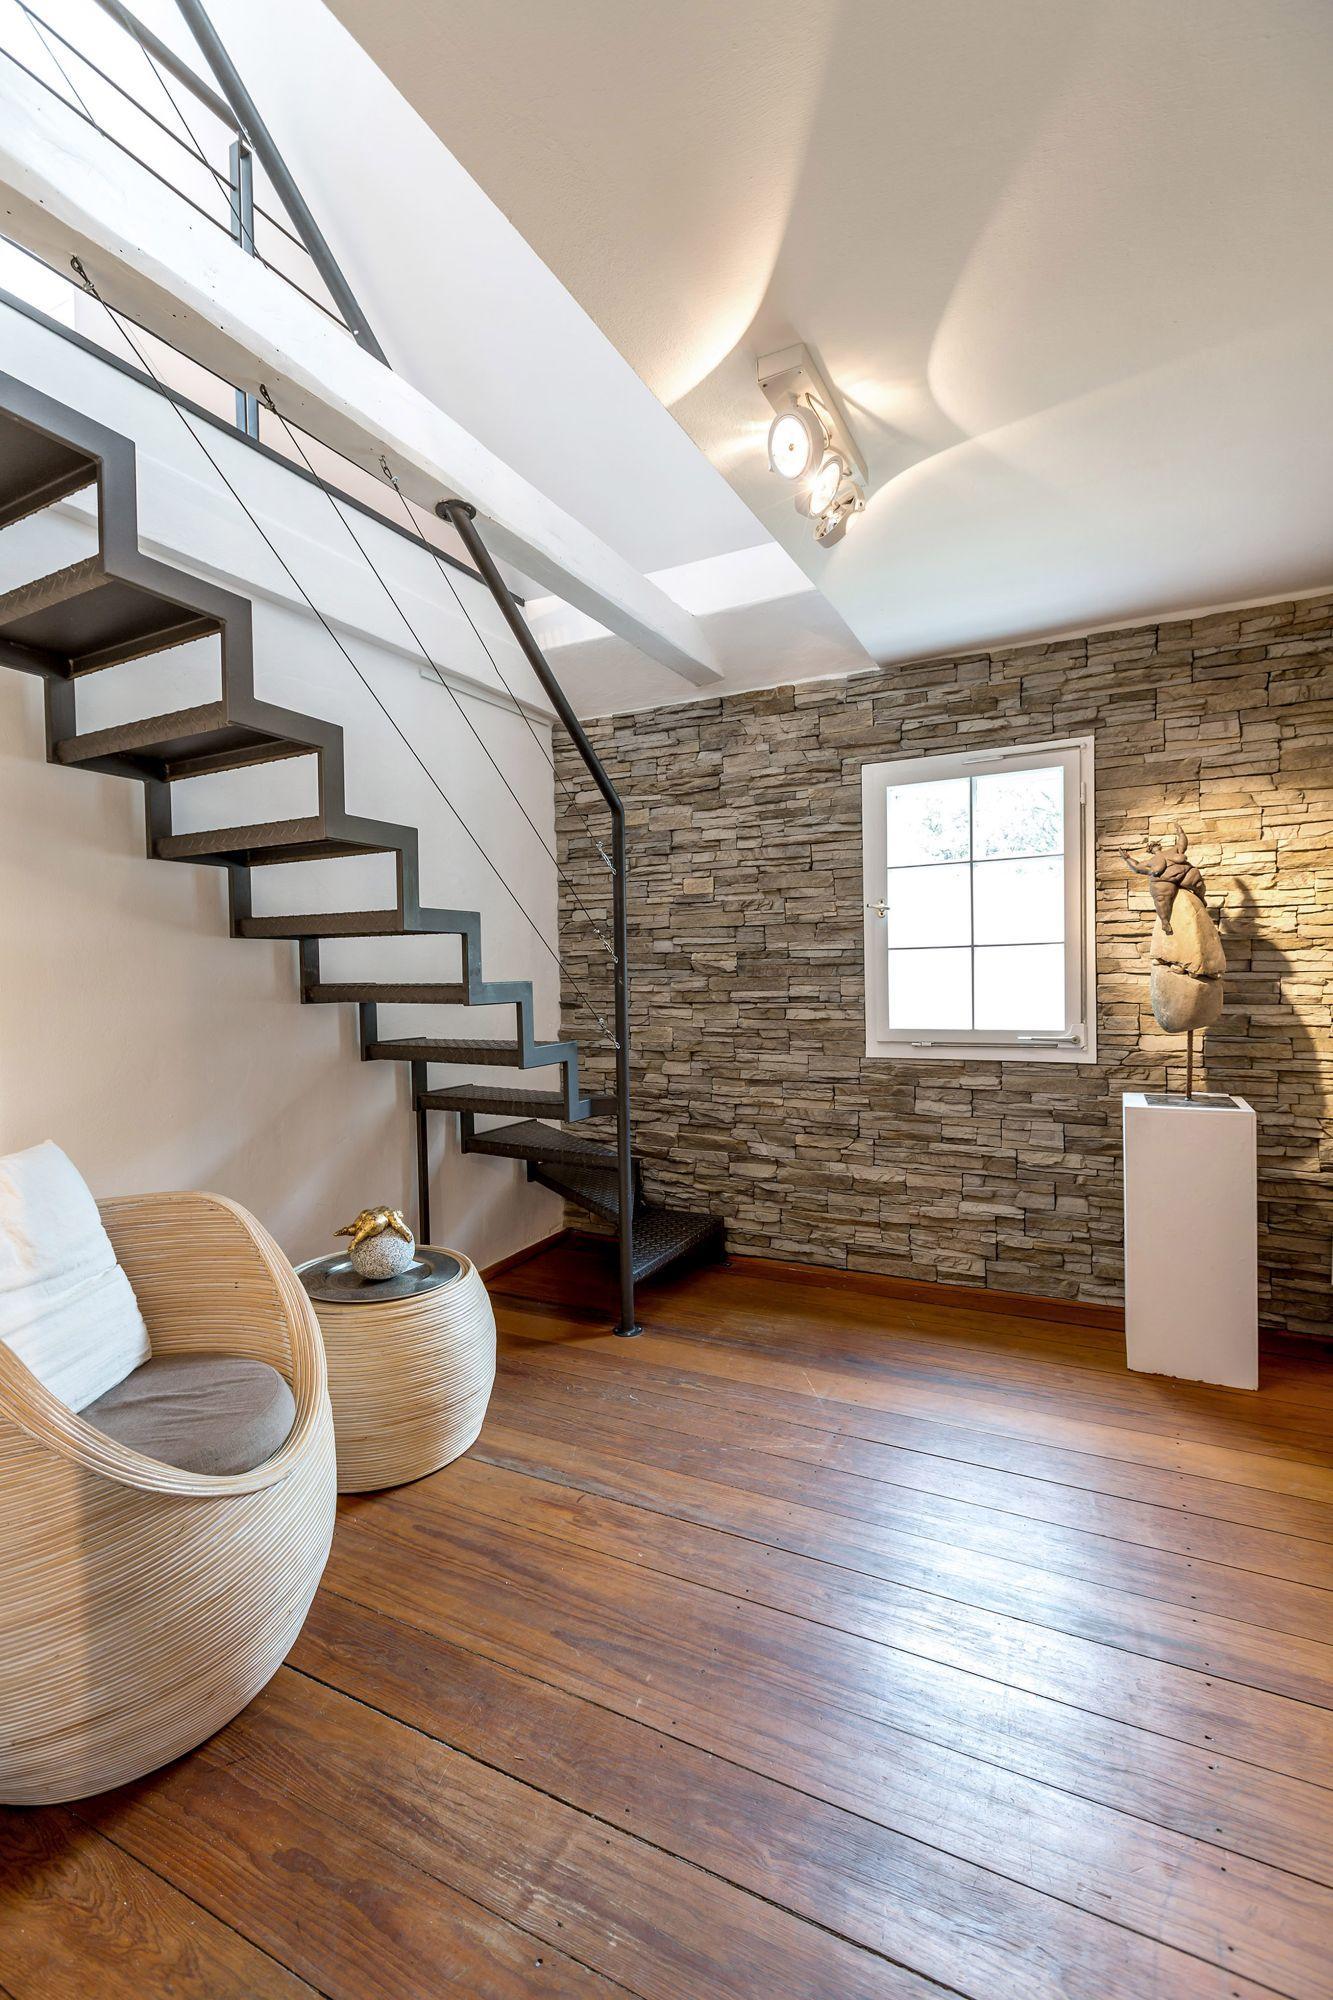 Vorraum und Aufgang zum Dachgeschoss